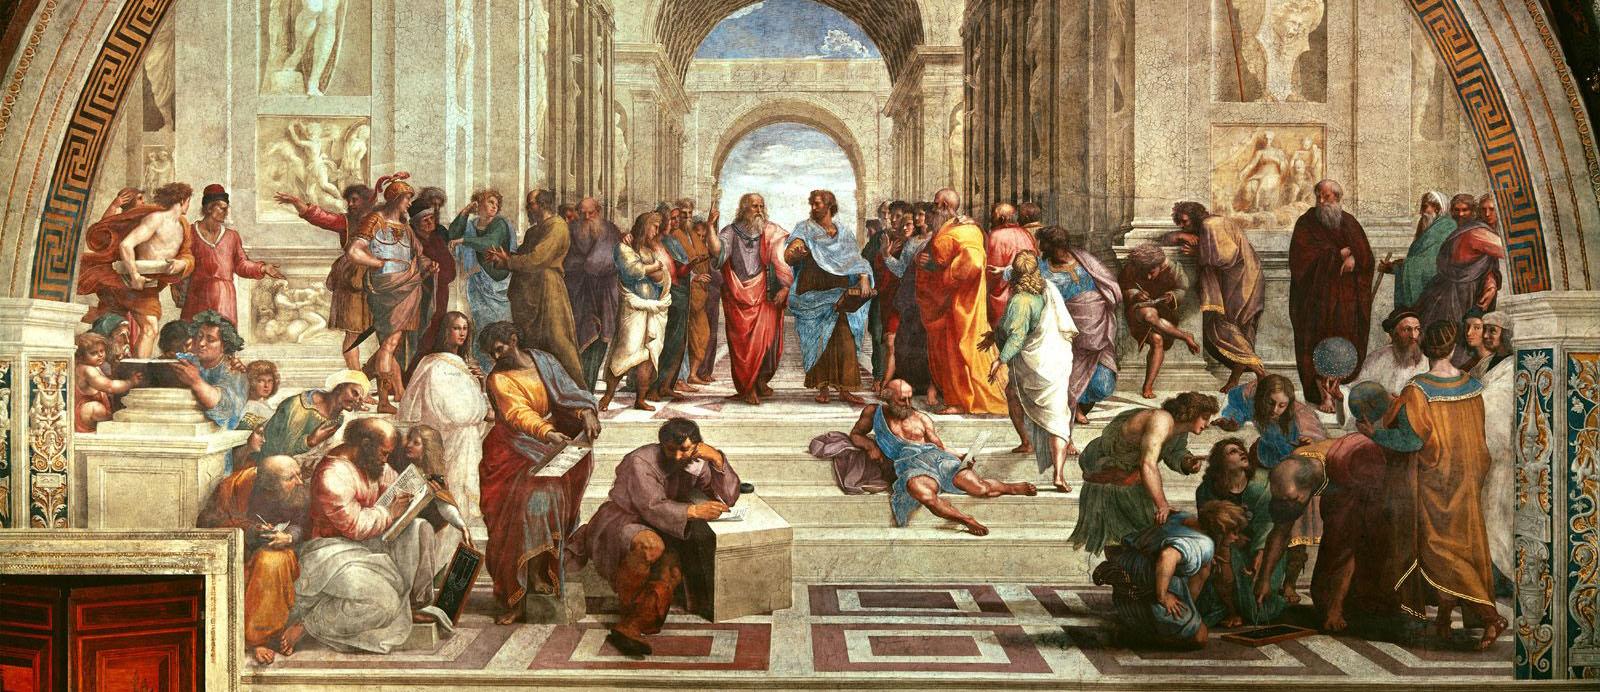 Аристократия в Древней Греции